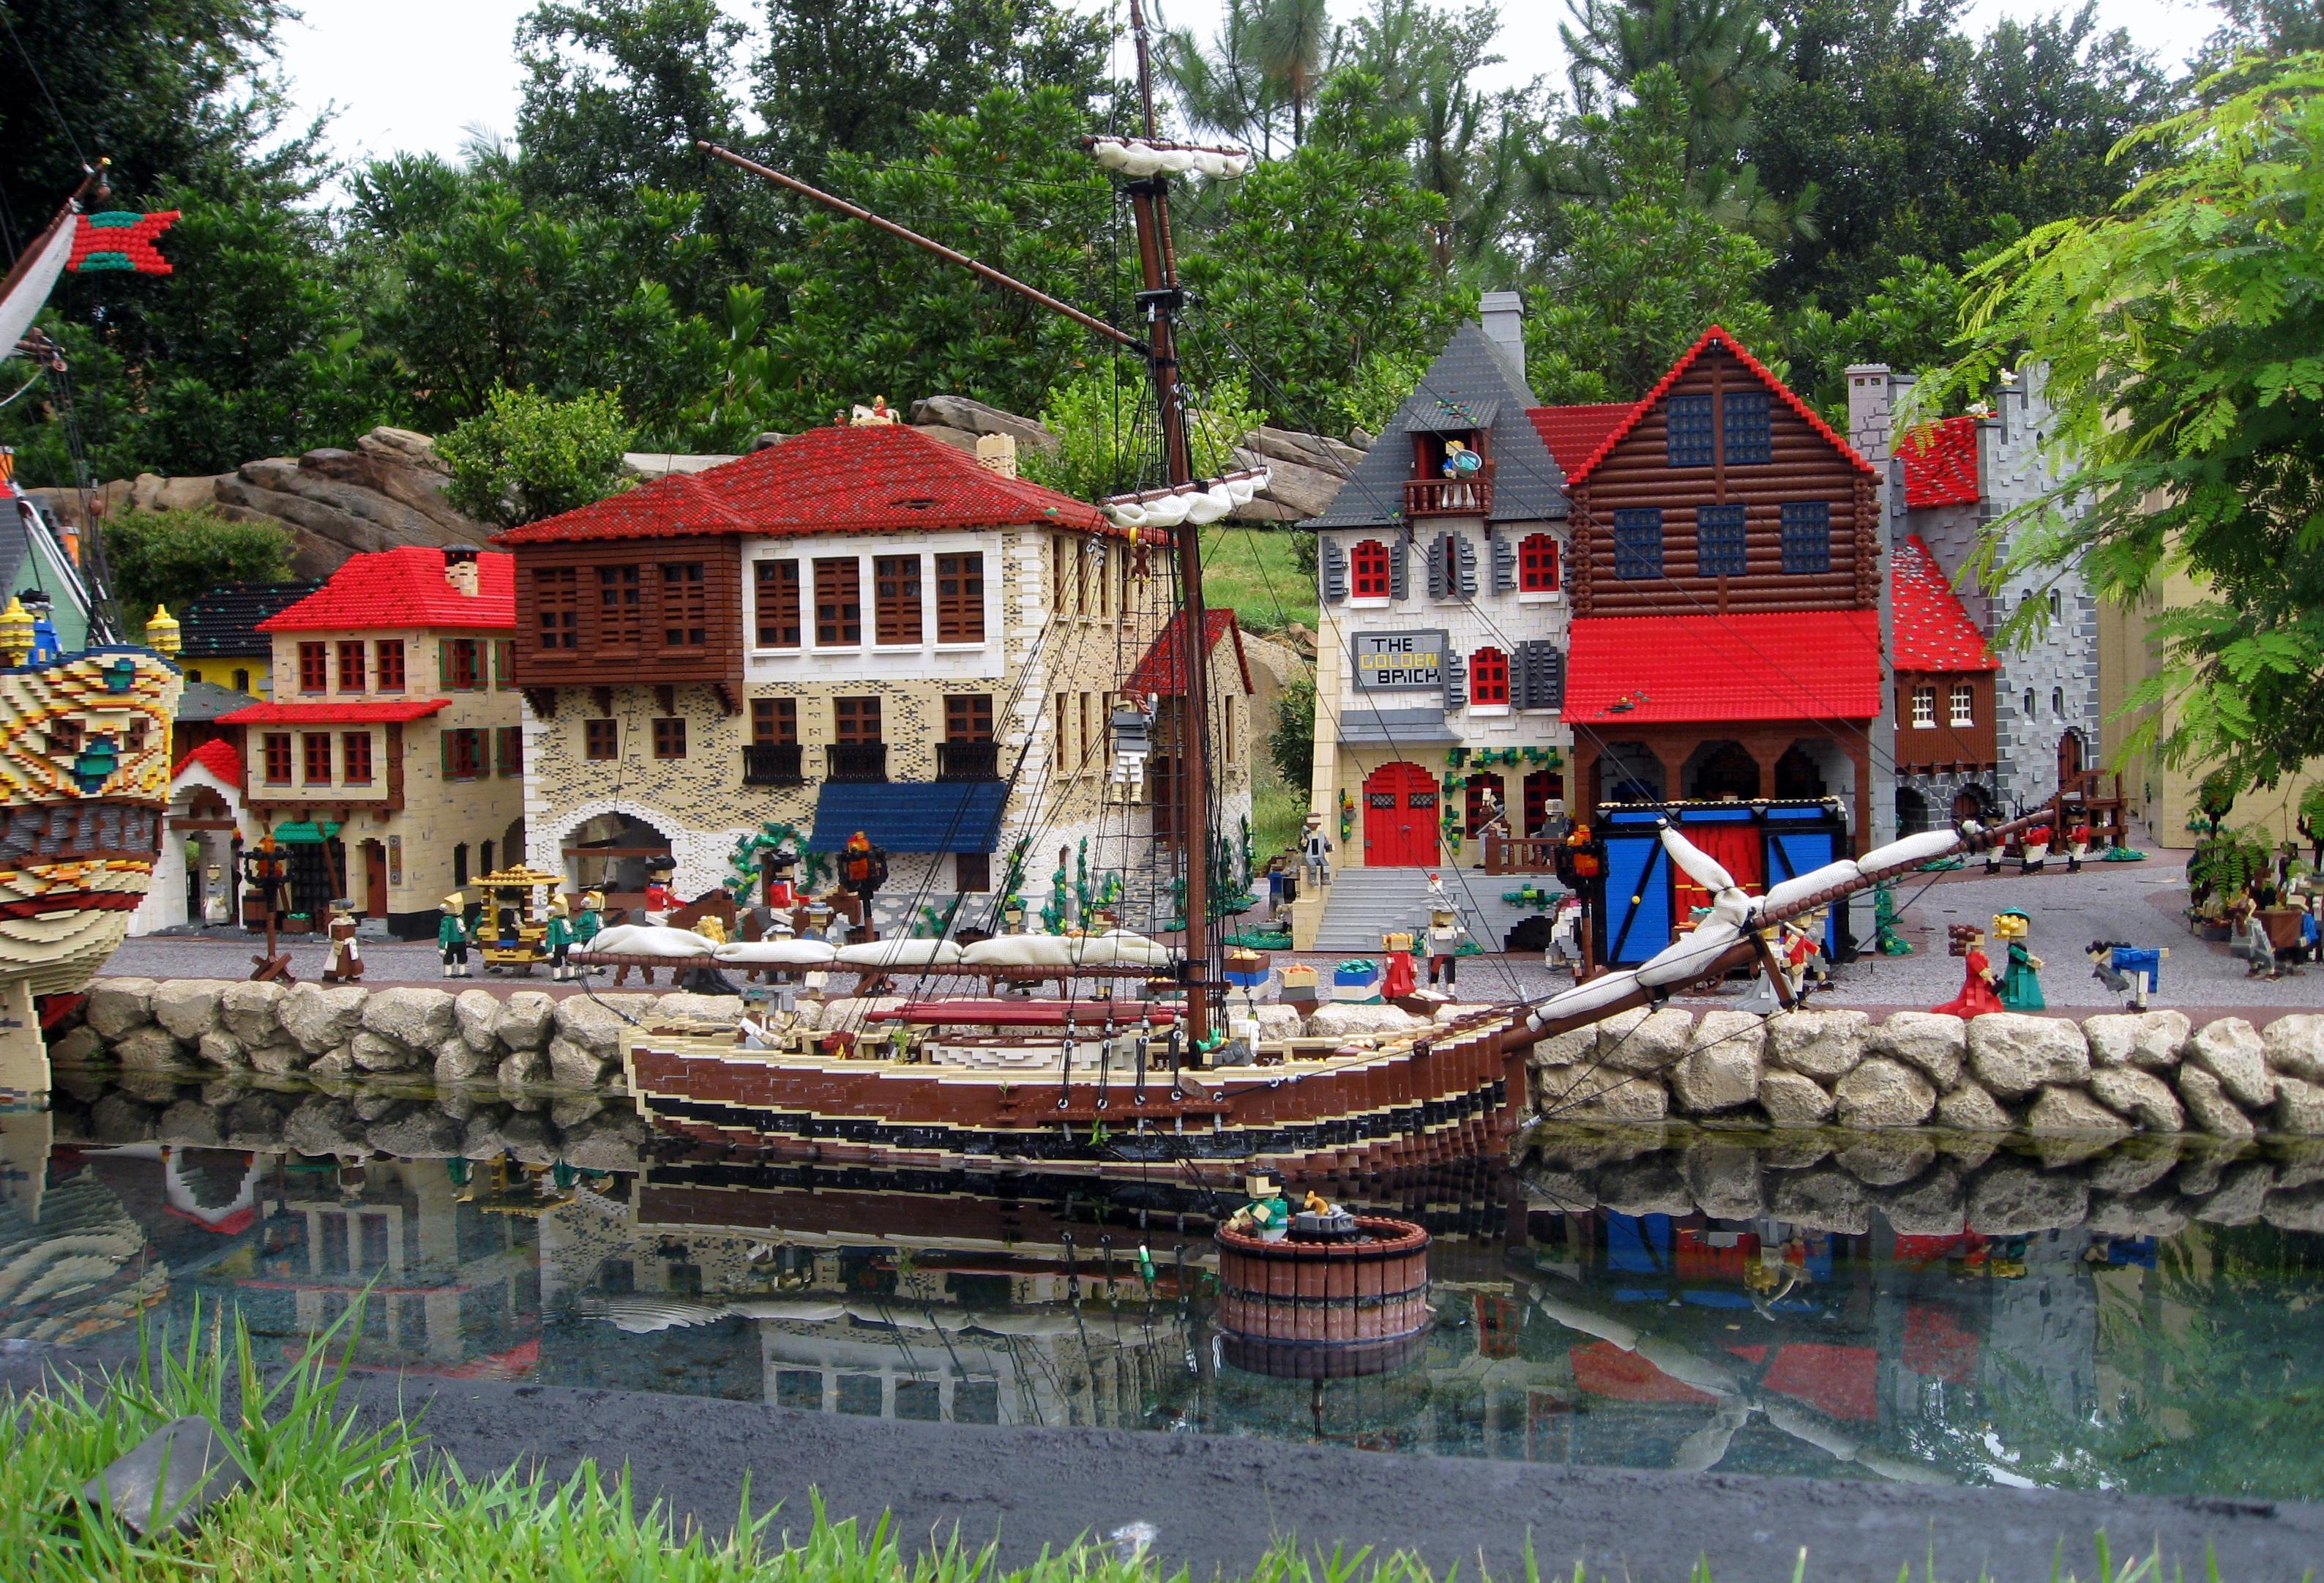 Winter Haven - Legoland Florida - Miniland USA - Pirate's Shores (9424164564).jpg